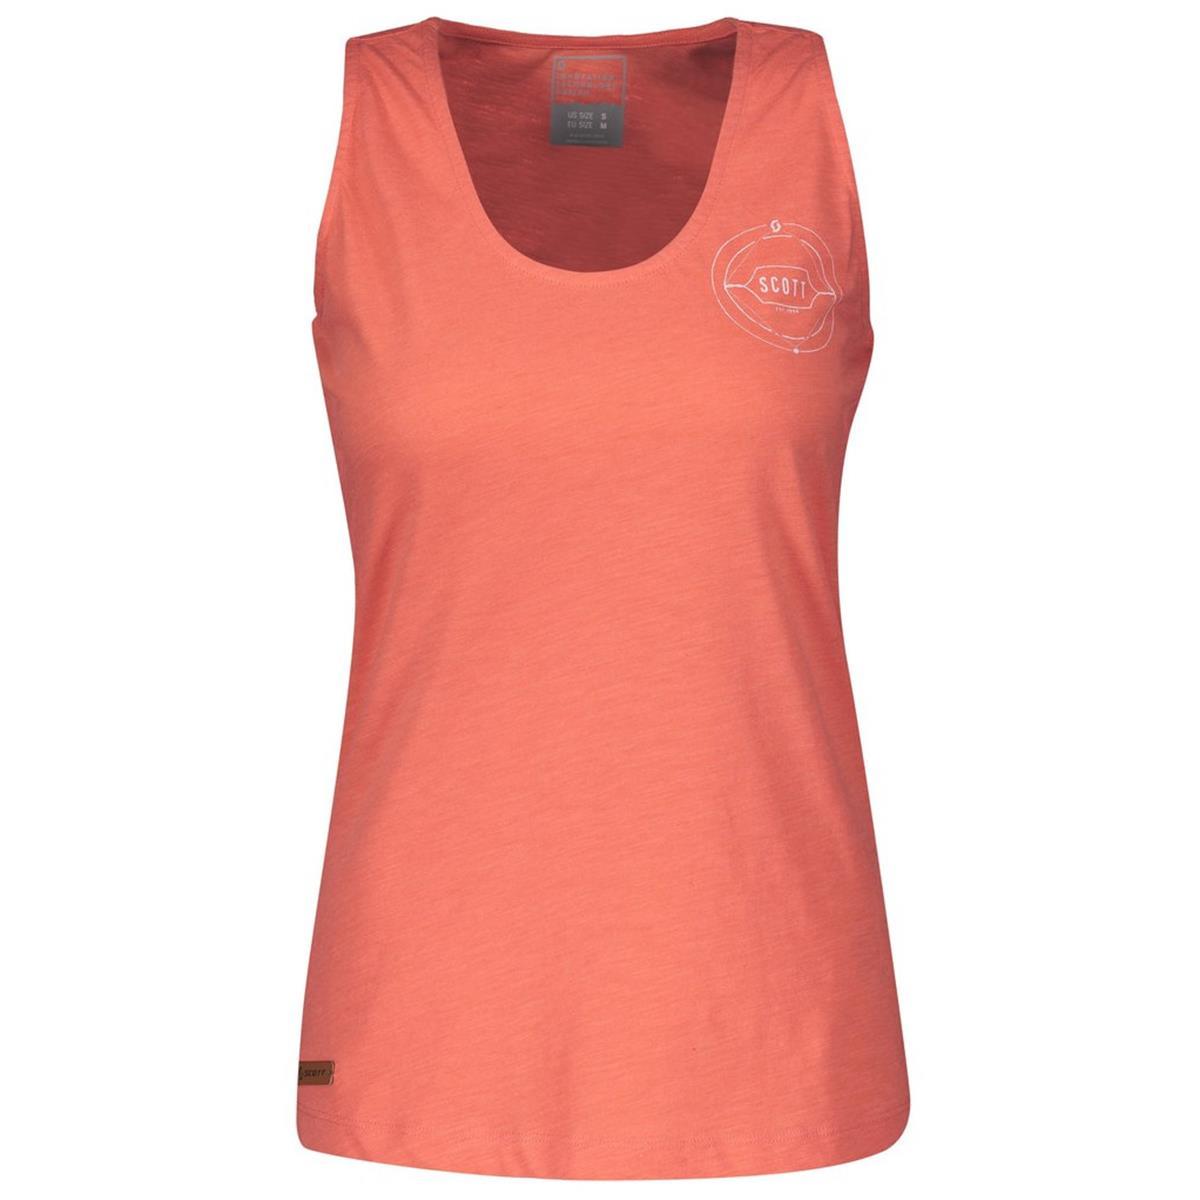 Scott Girls Tank Top 10 Casual Camellia Pink Melange